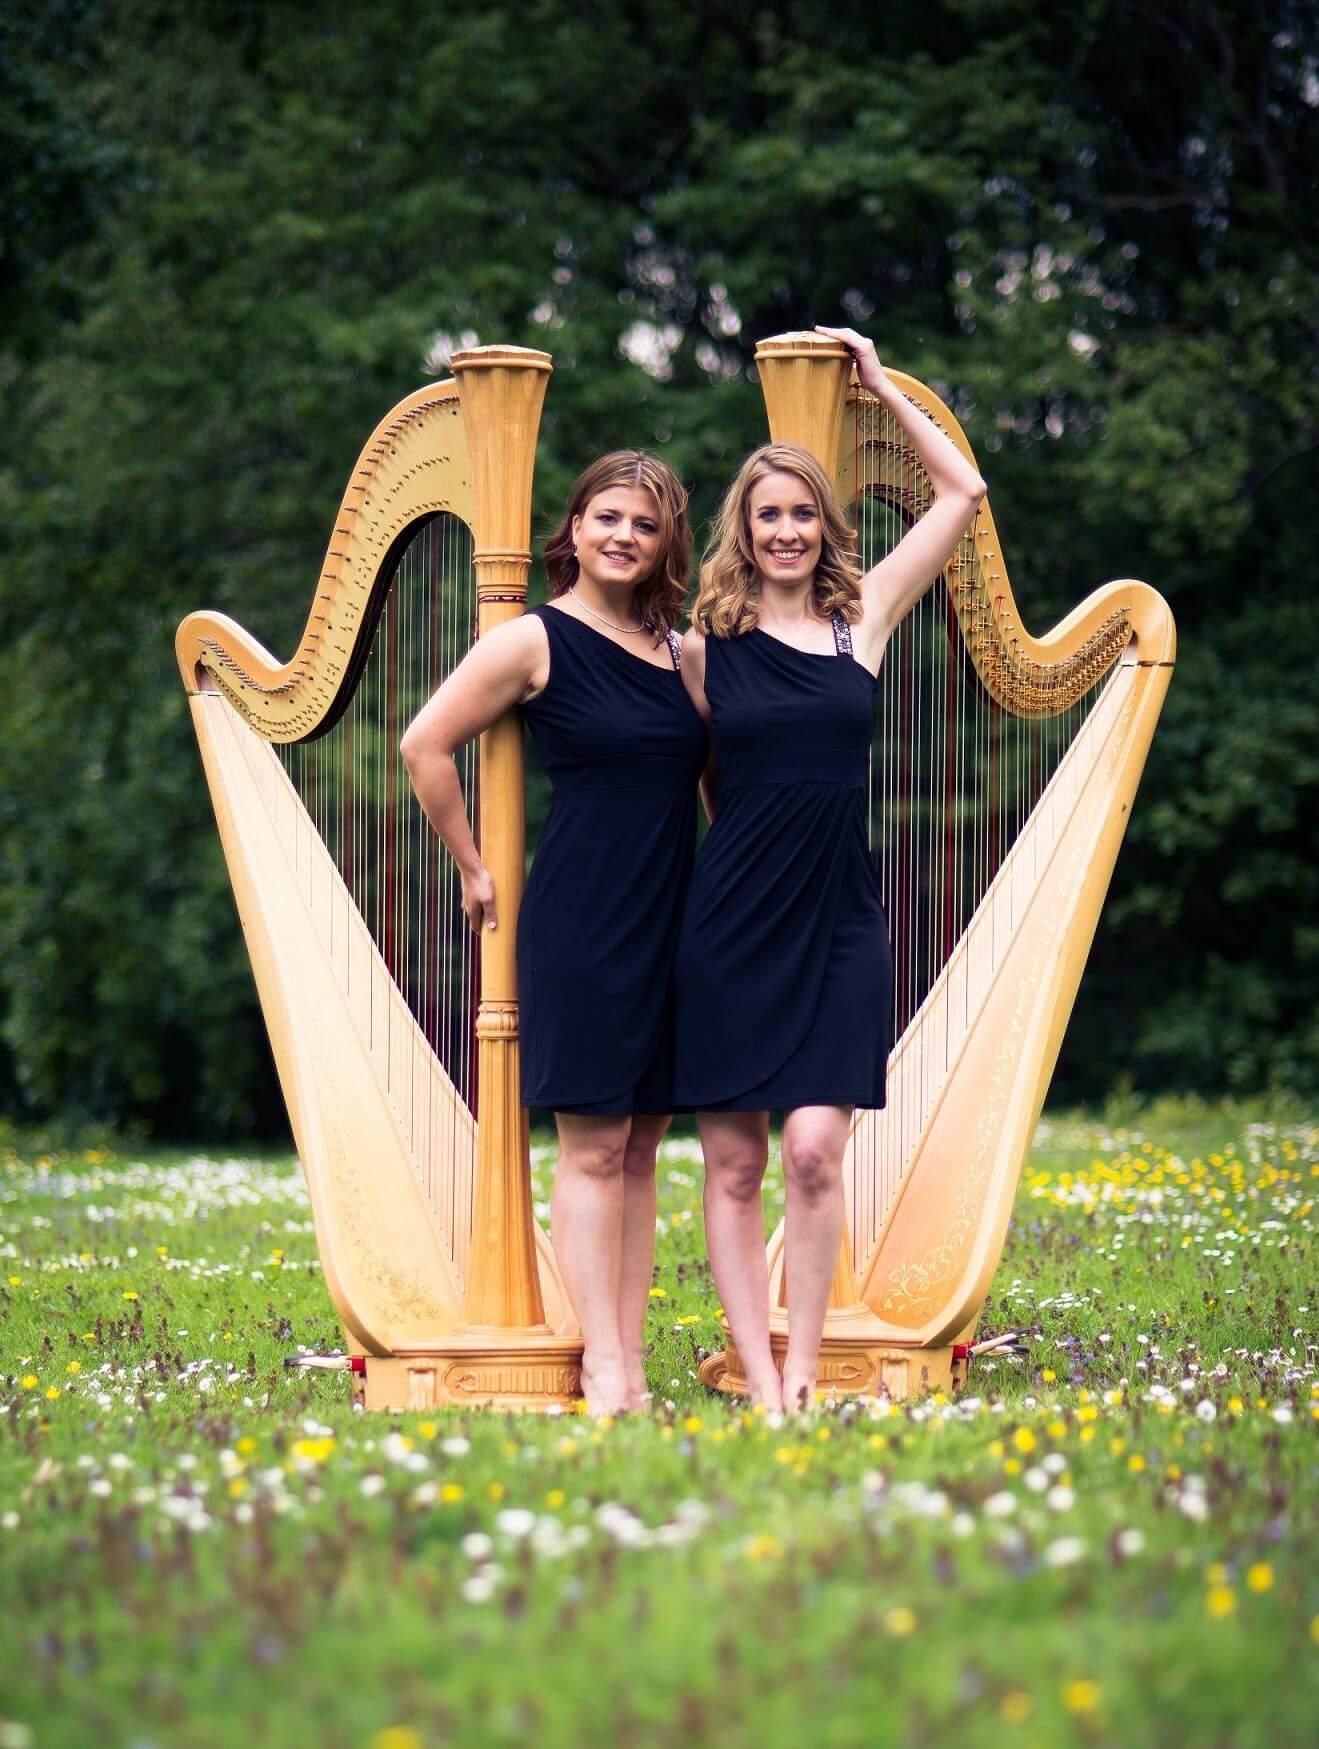 Harparlando-Konzert Duisburg